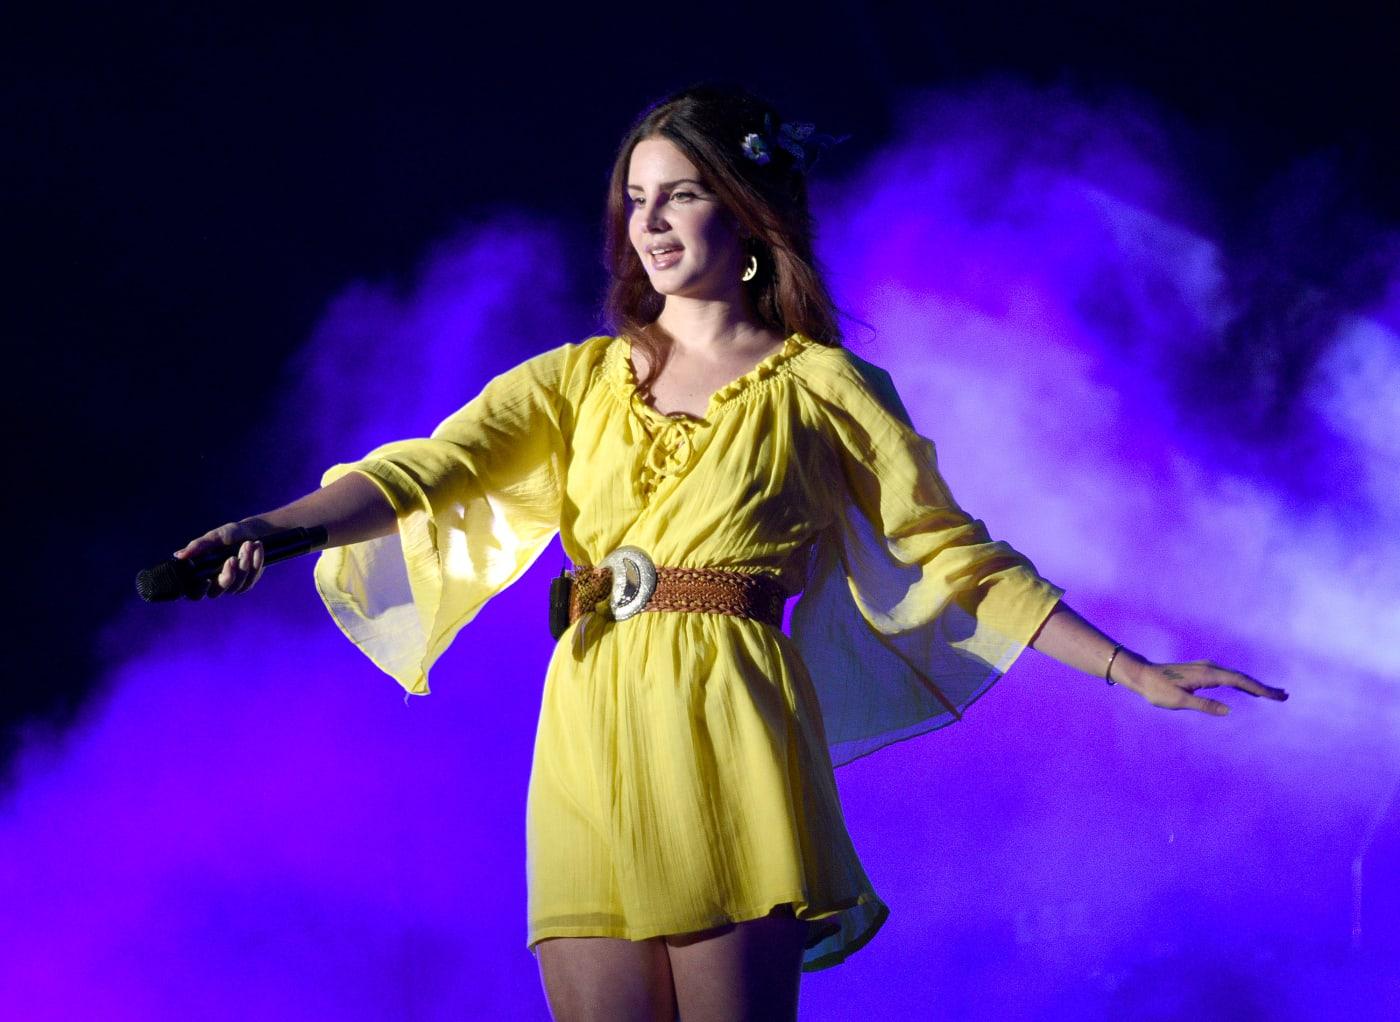 Lana Del Rey Yellow Dress Image